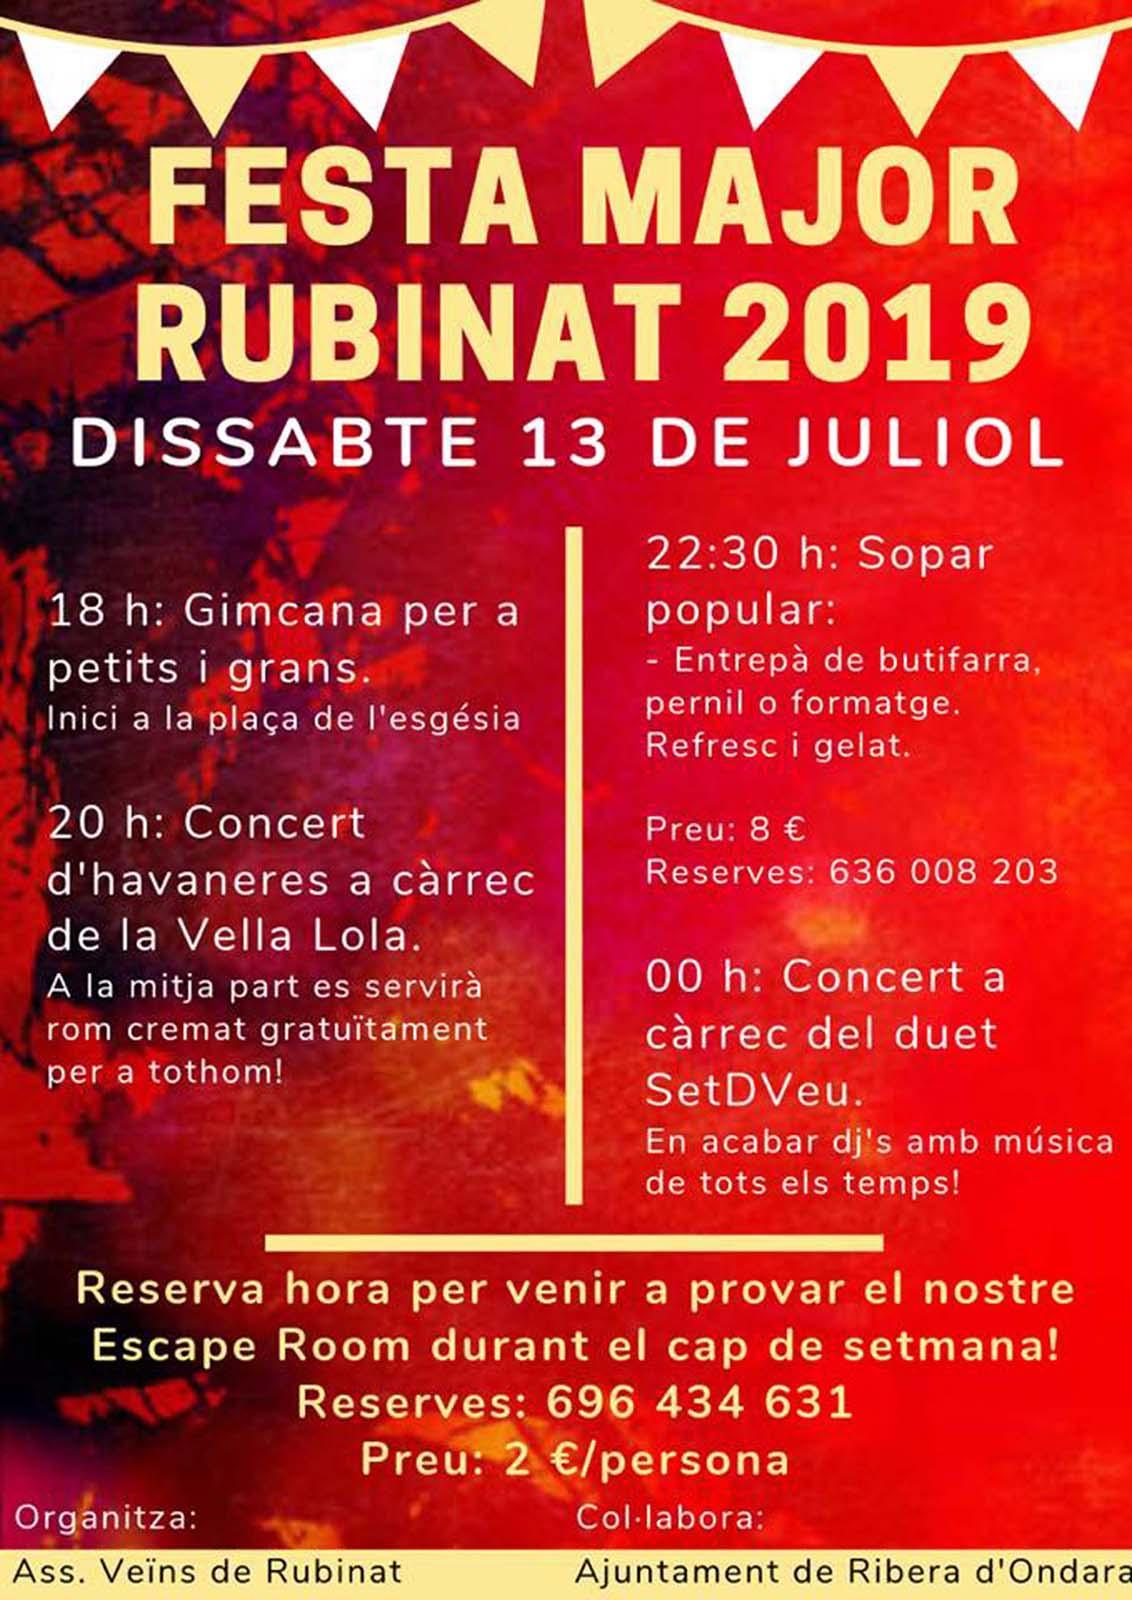 Festa Major de Rubinat 2019